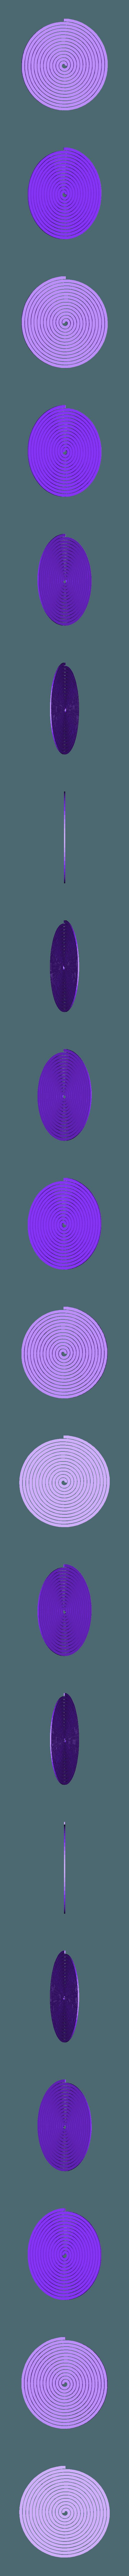 60mm_spiral.stl Download free SCAD file Customizable Spiral Generator • Model to 3D print, WalterHsiao